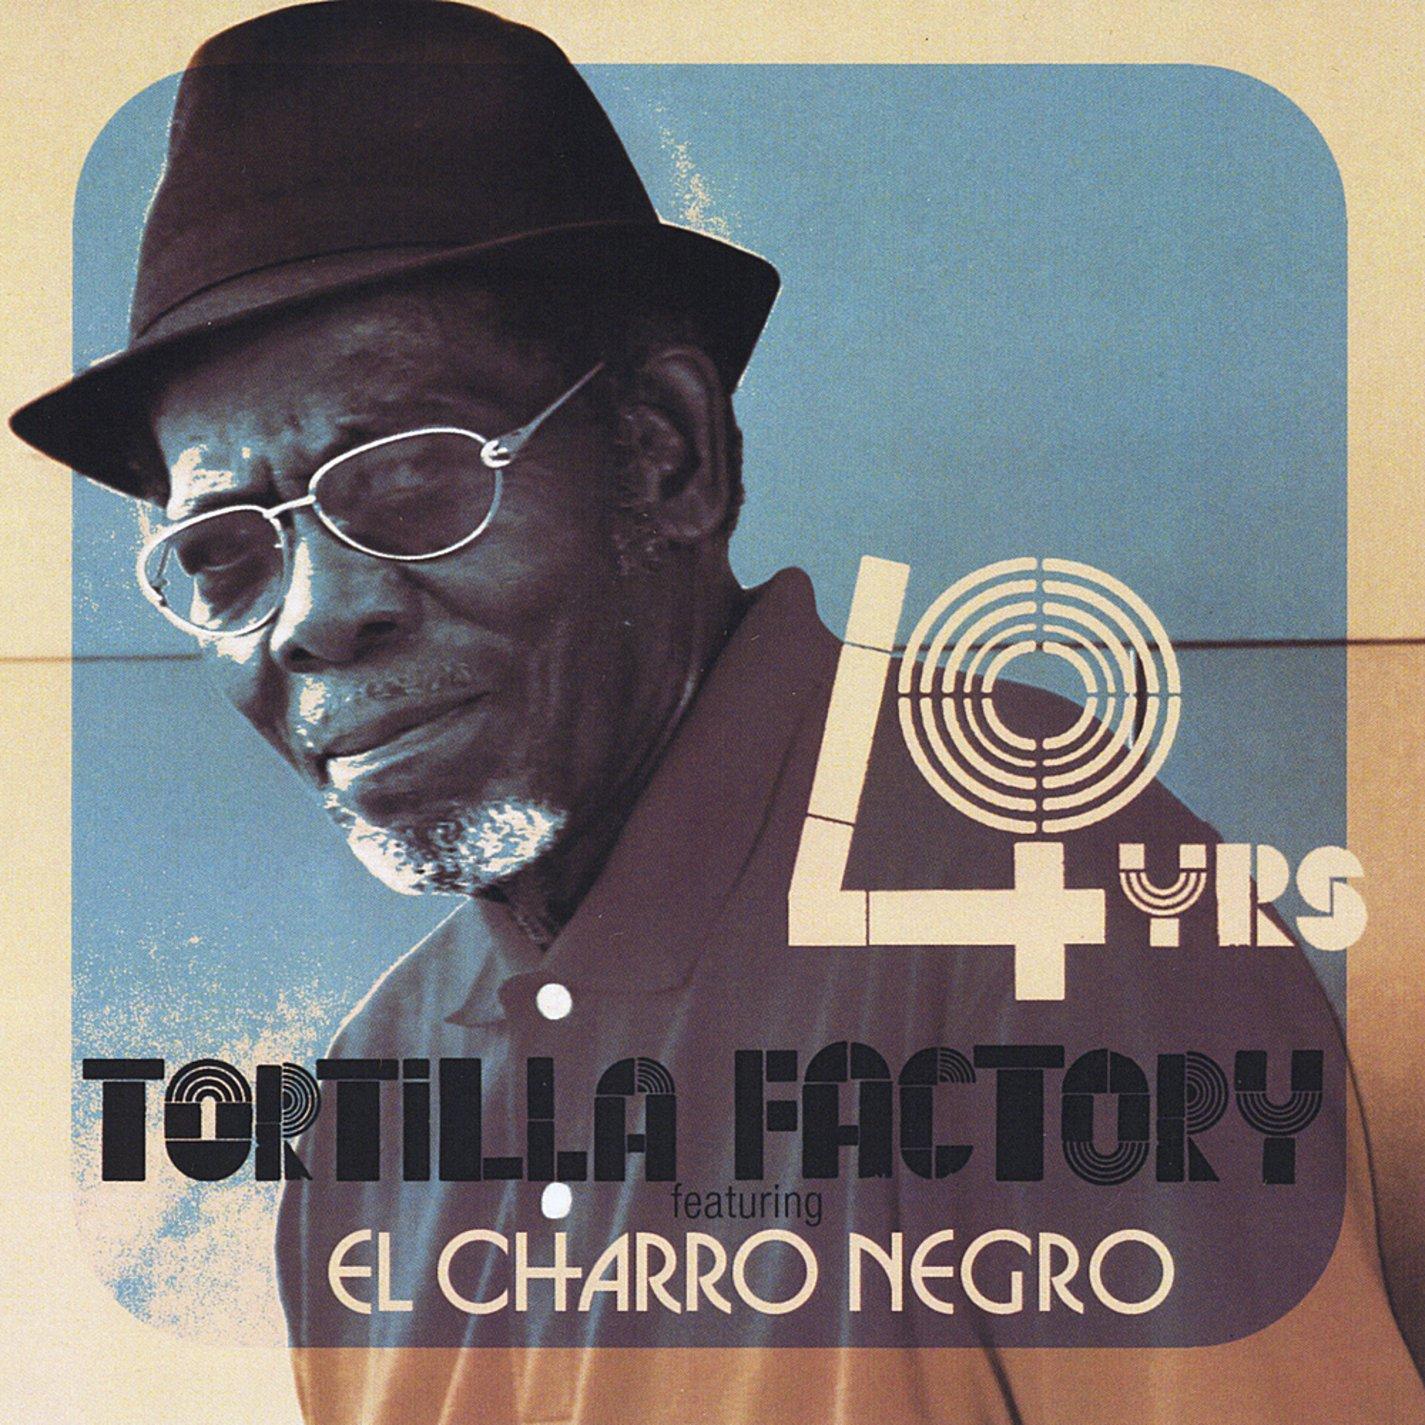 40 Years Tortilla Factory                                                                                                                                                                                                                                                    <span class=